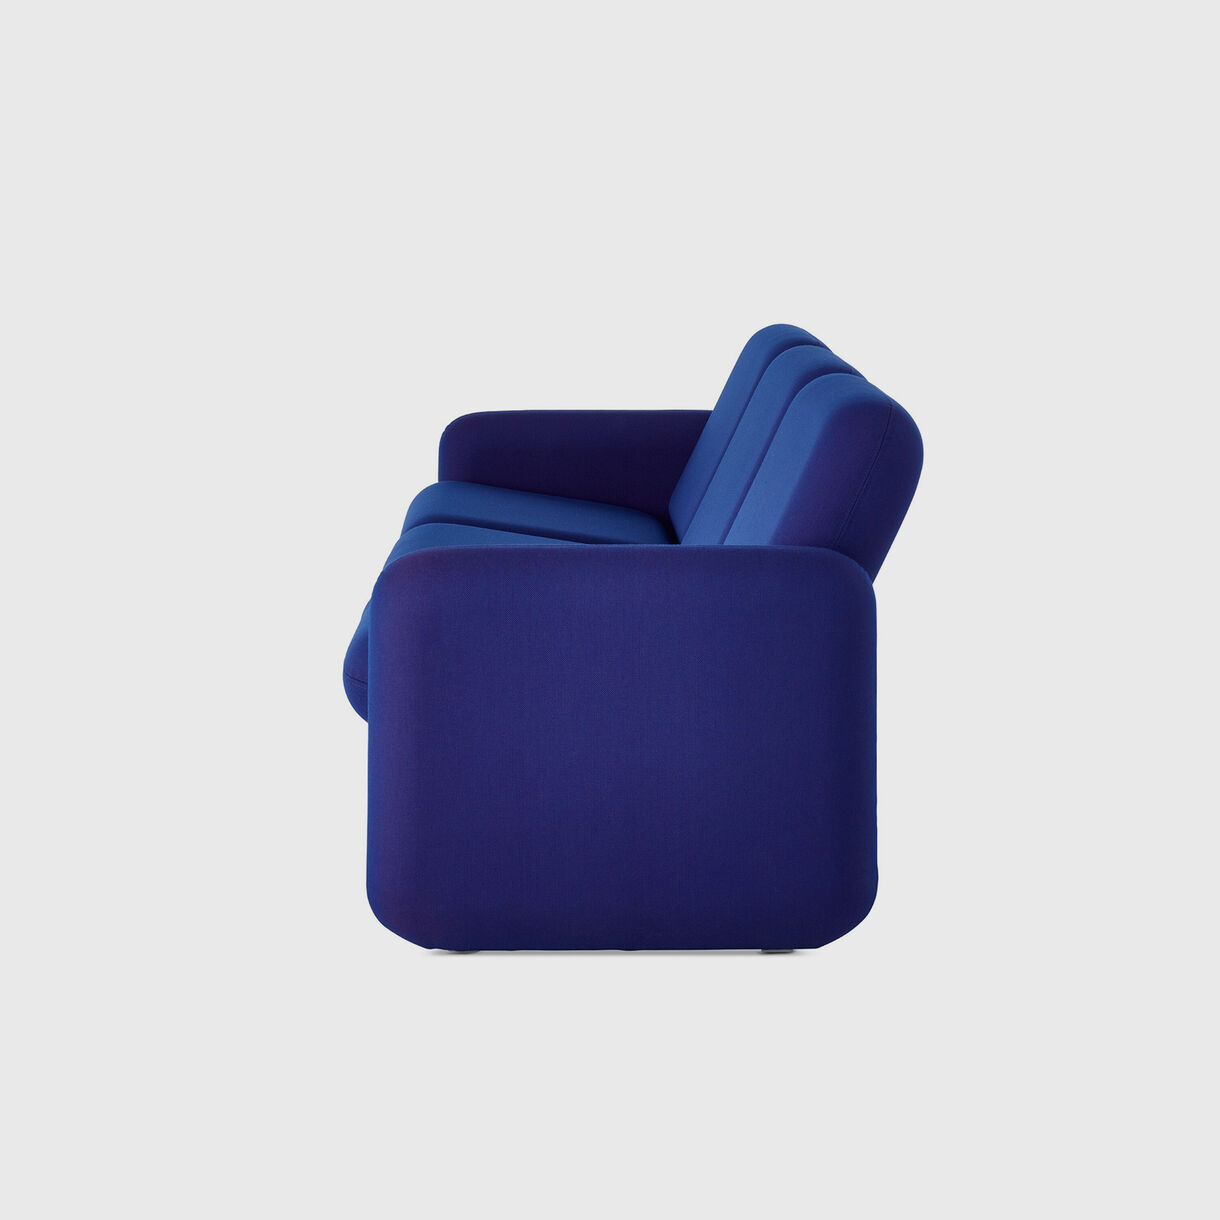 Wilkes Modular Sofa Group, 3 Seater